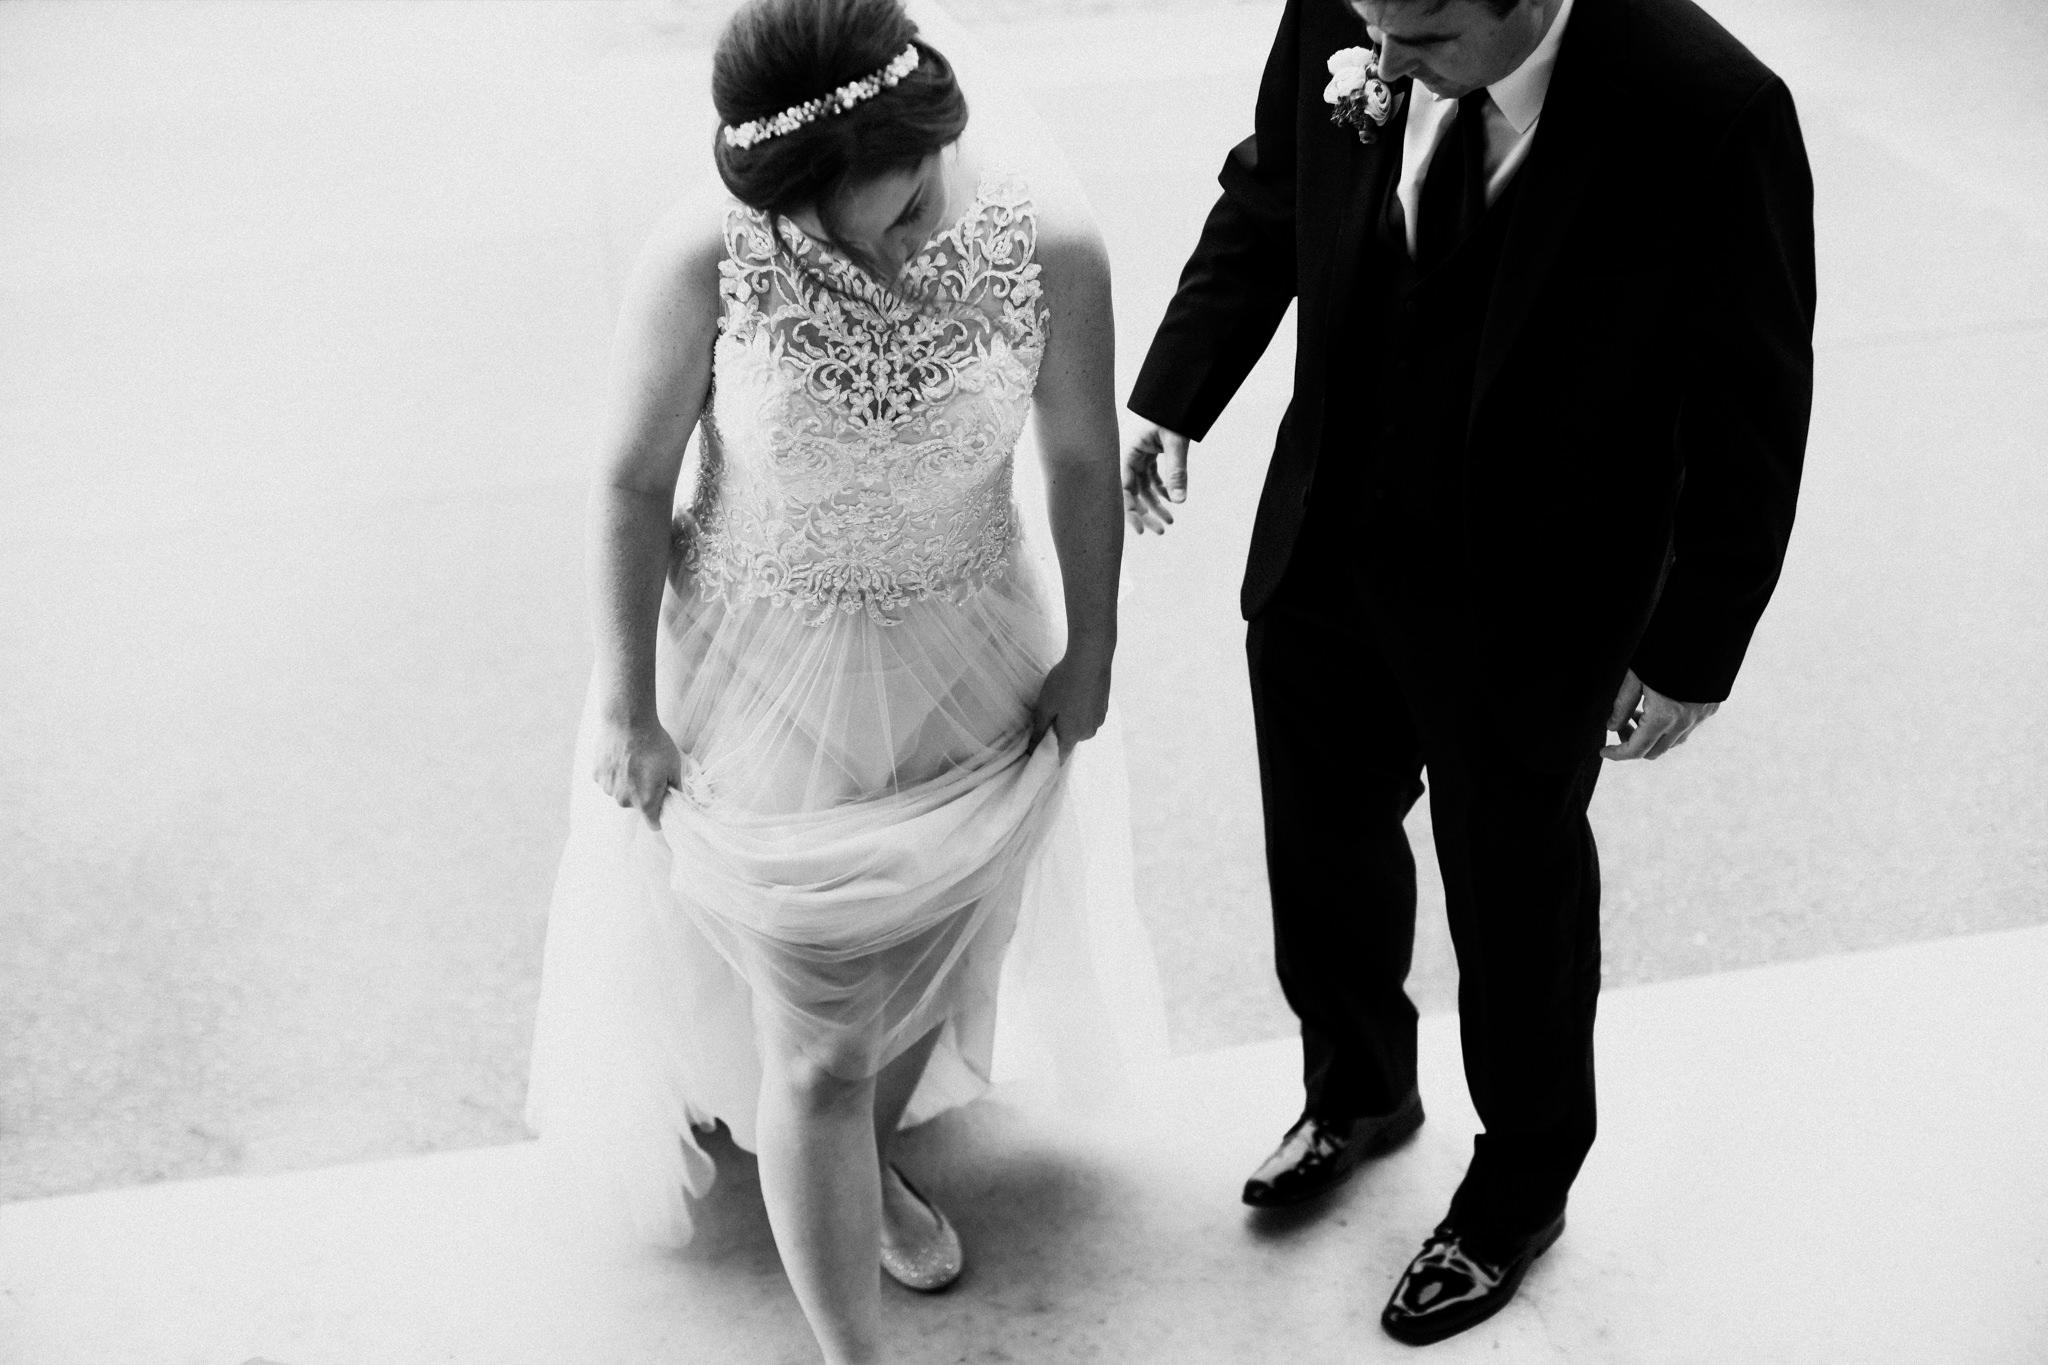 memphis-wedding-photographer-cassie-cook-photography-5.jpg